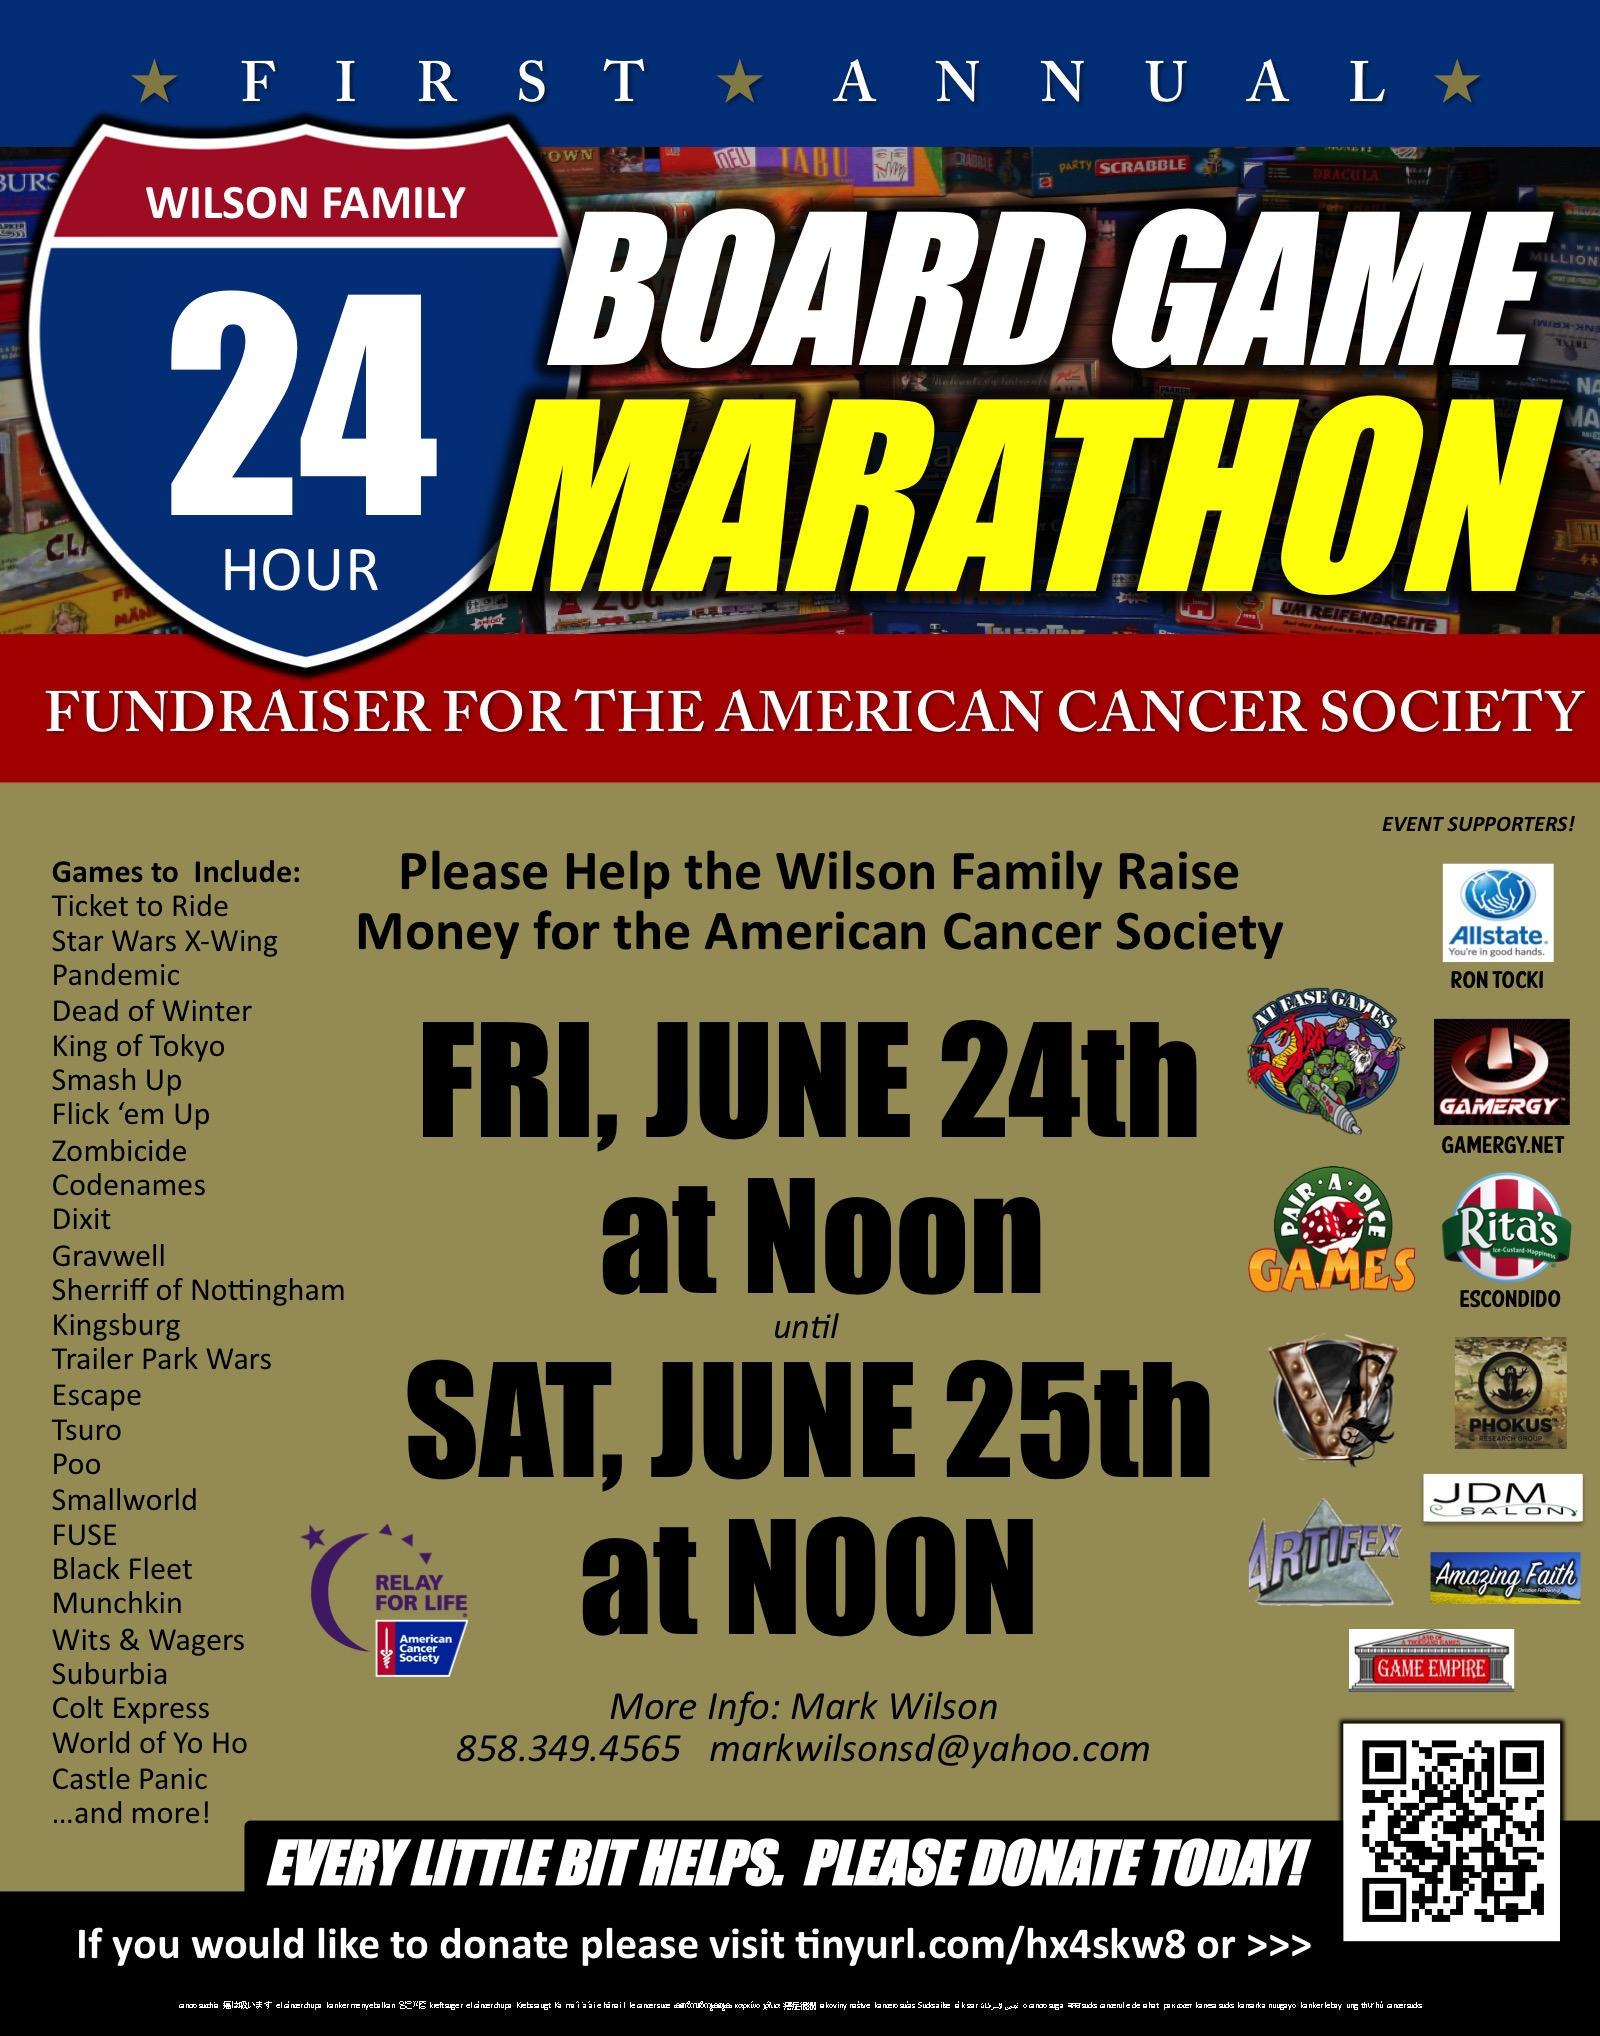 boardgamemarathon